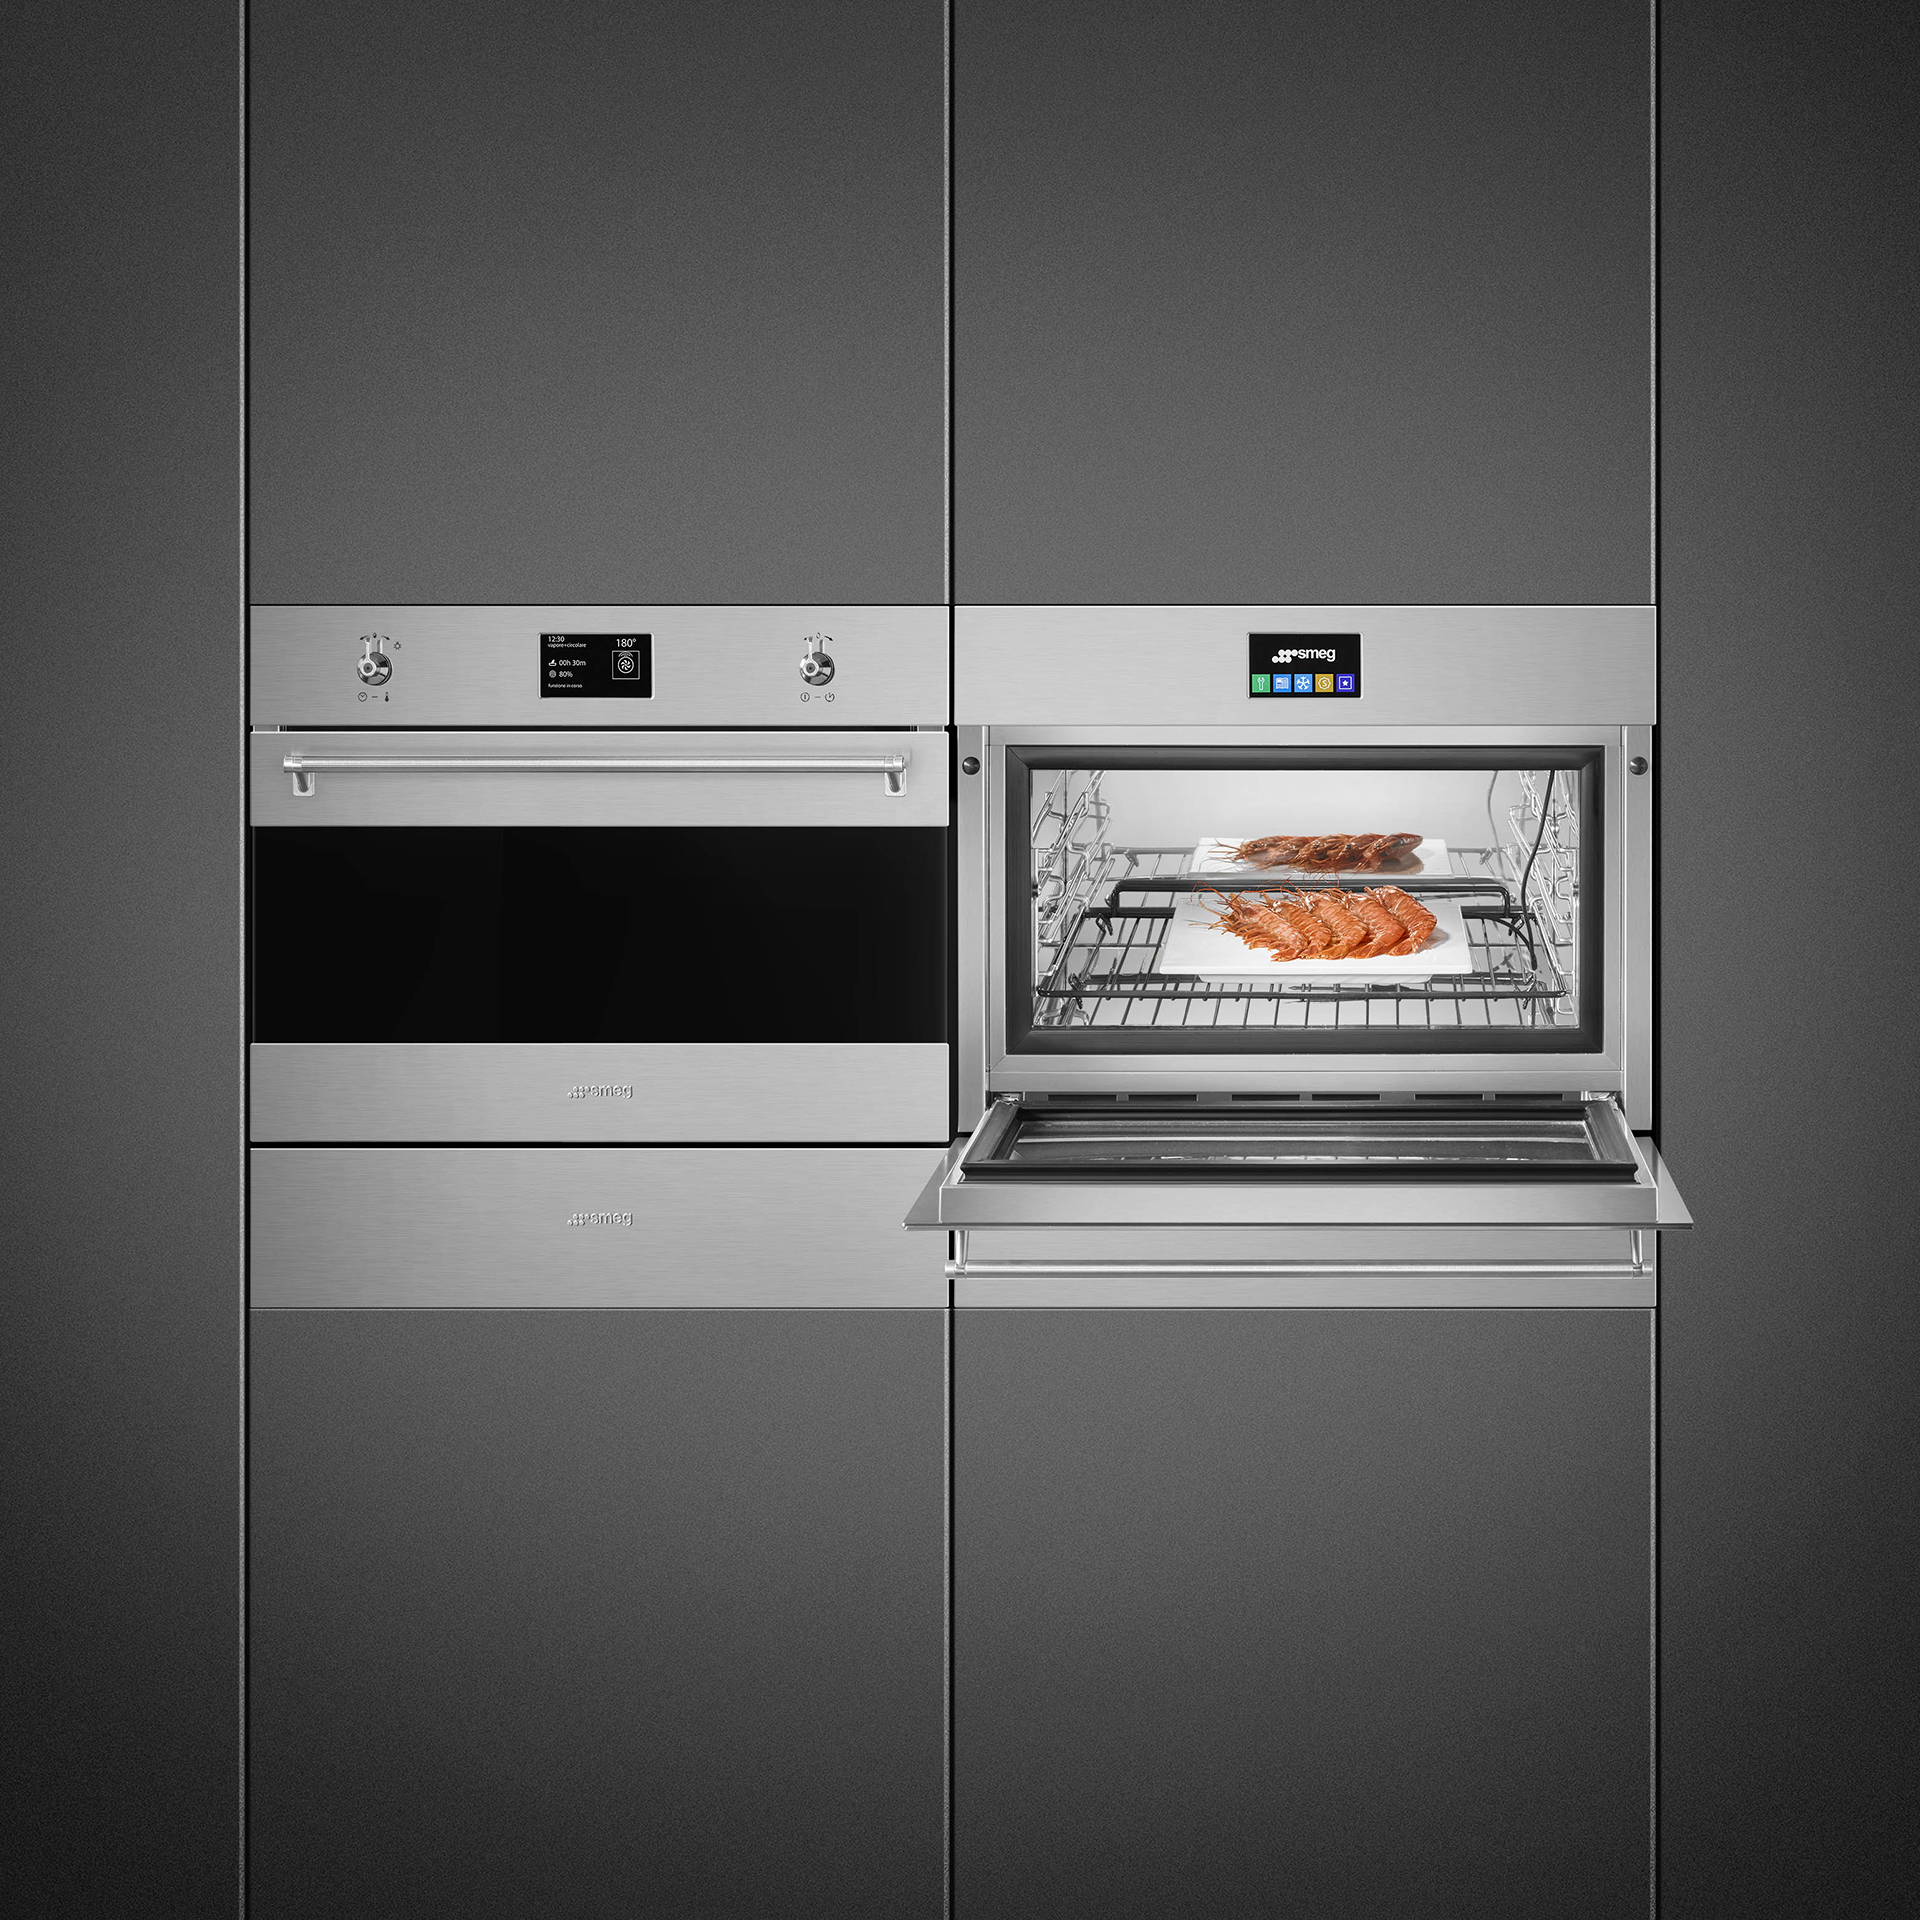 Blast chiller, Vacuum drawer and Combi Steam Oven